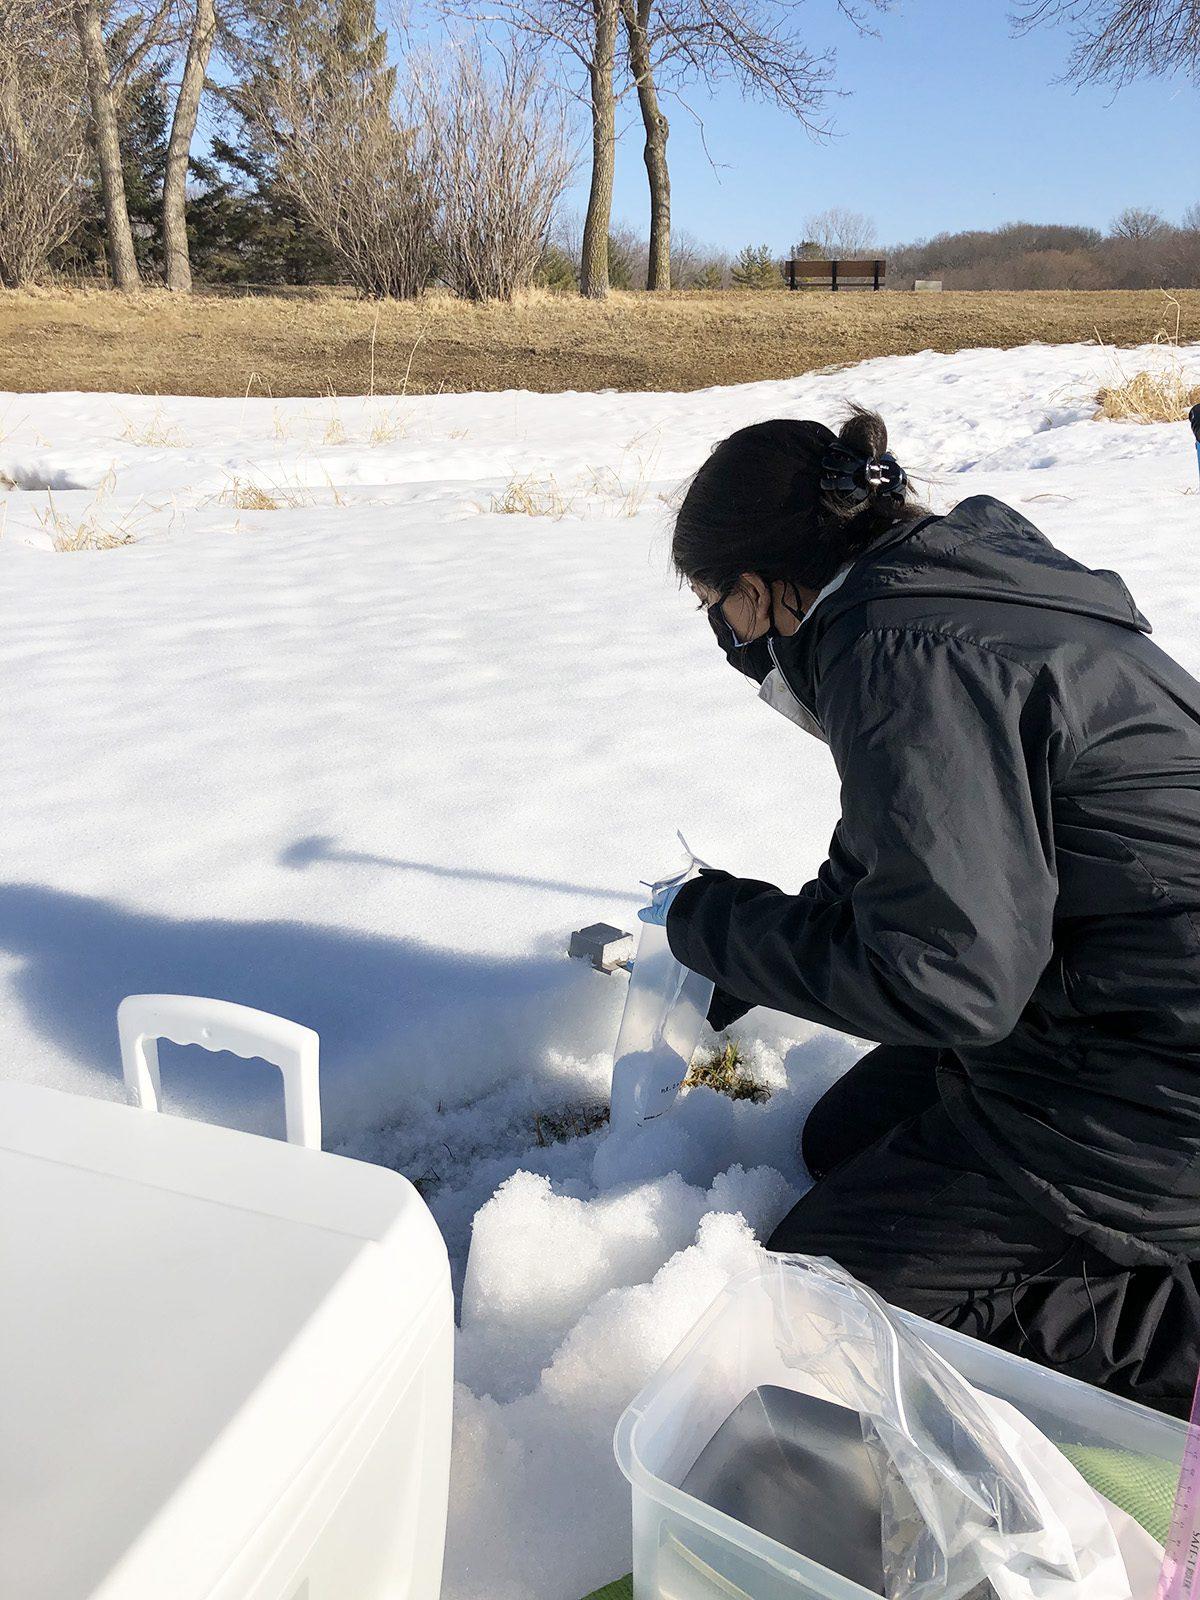 Kavya Devgun '21 collects snow samples for research behind Skoglund Athletic Center.